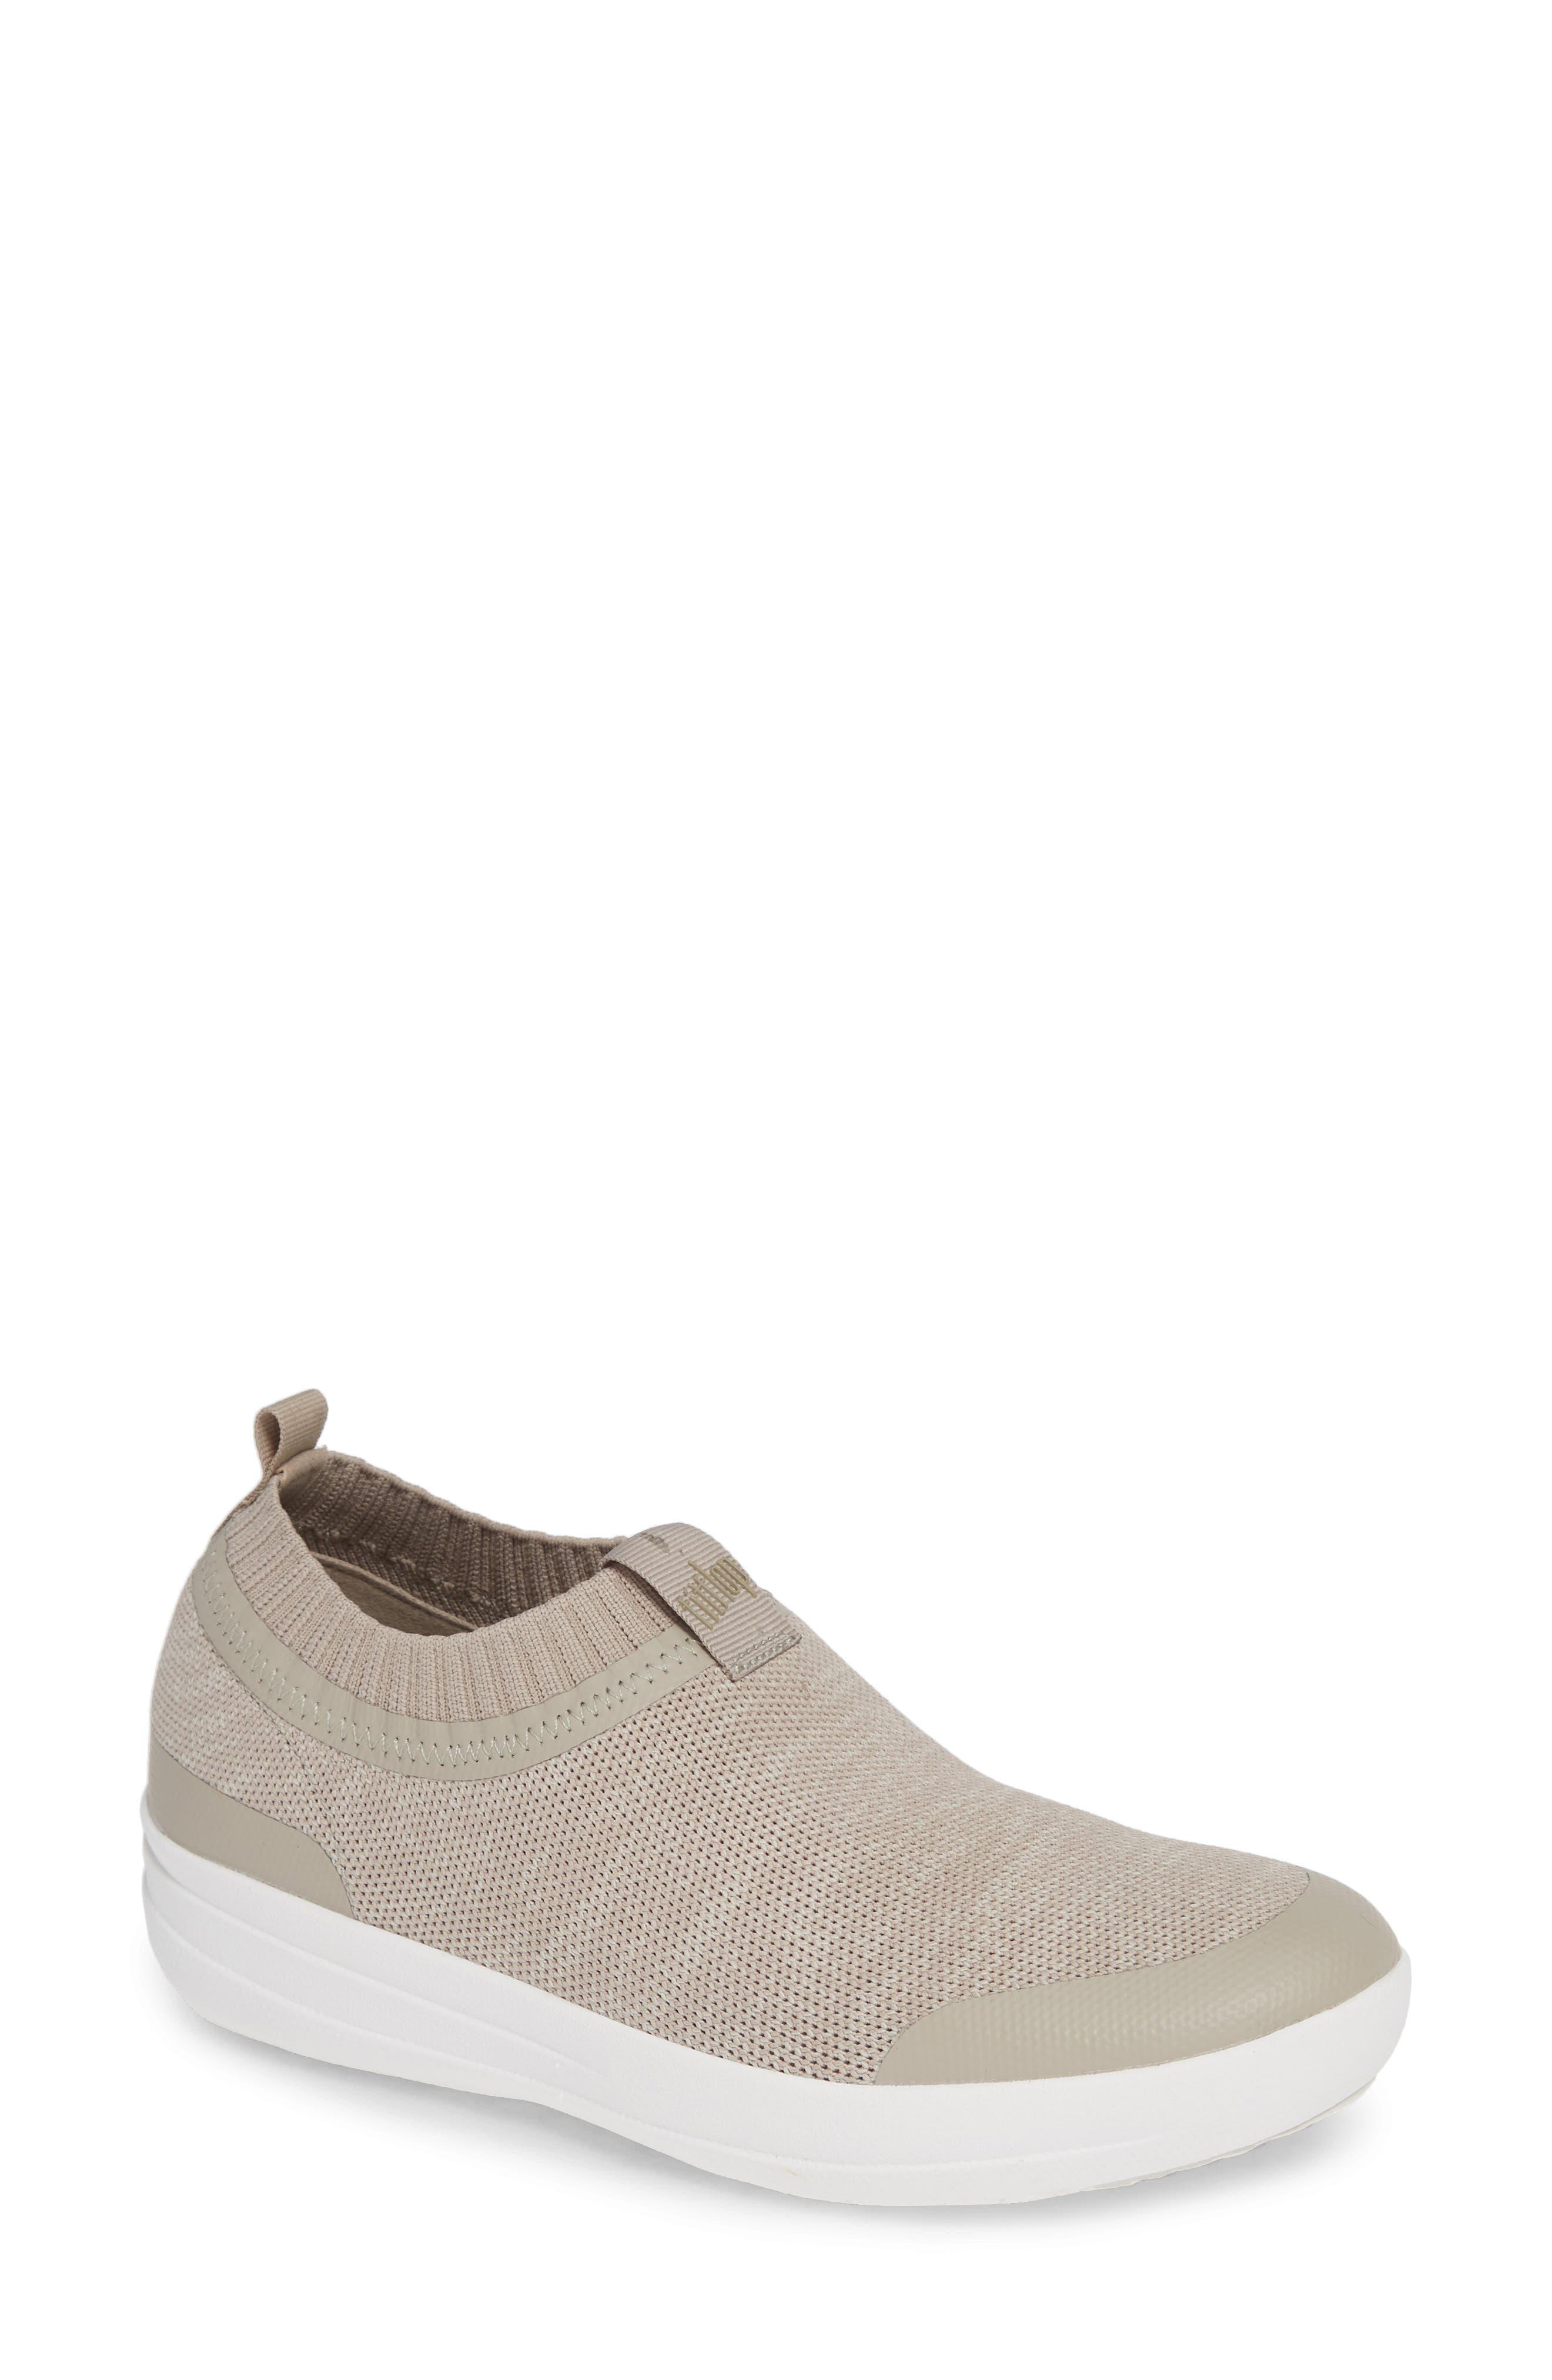 FITFLOP Uberknit Slip-On Sneaker, Main, color, 256